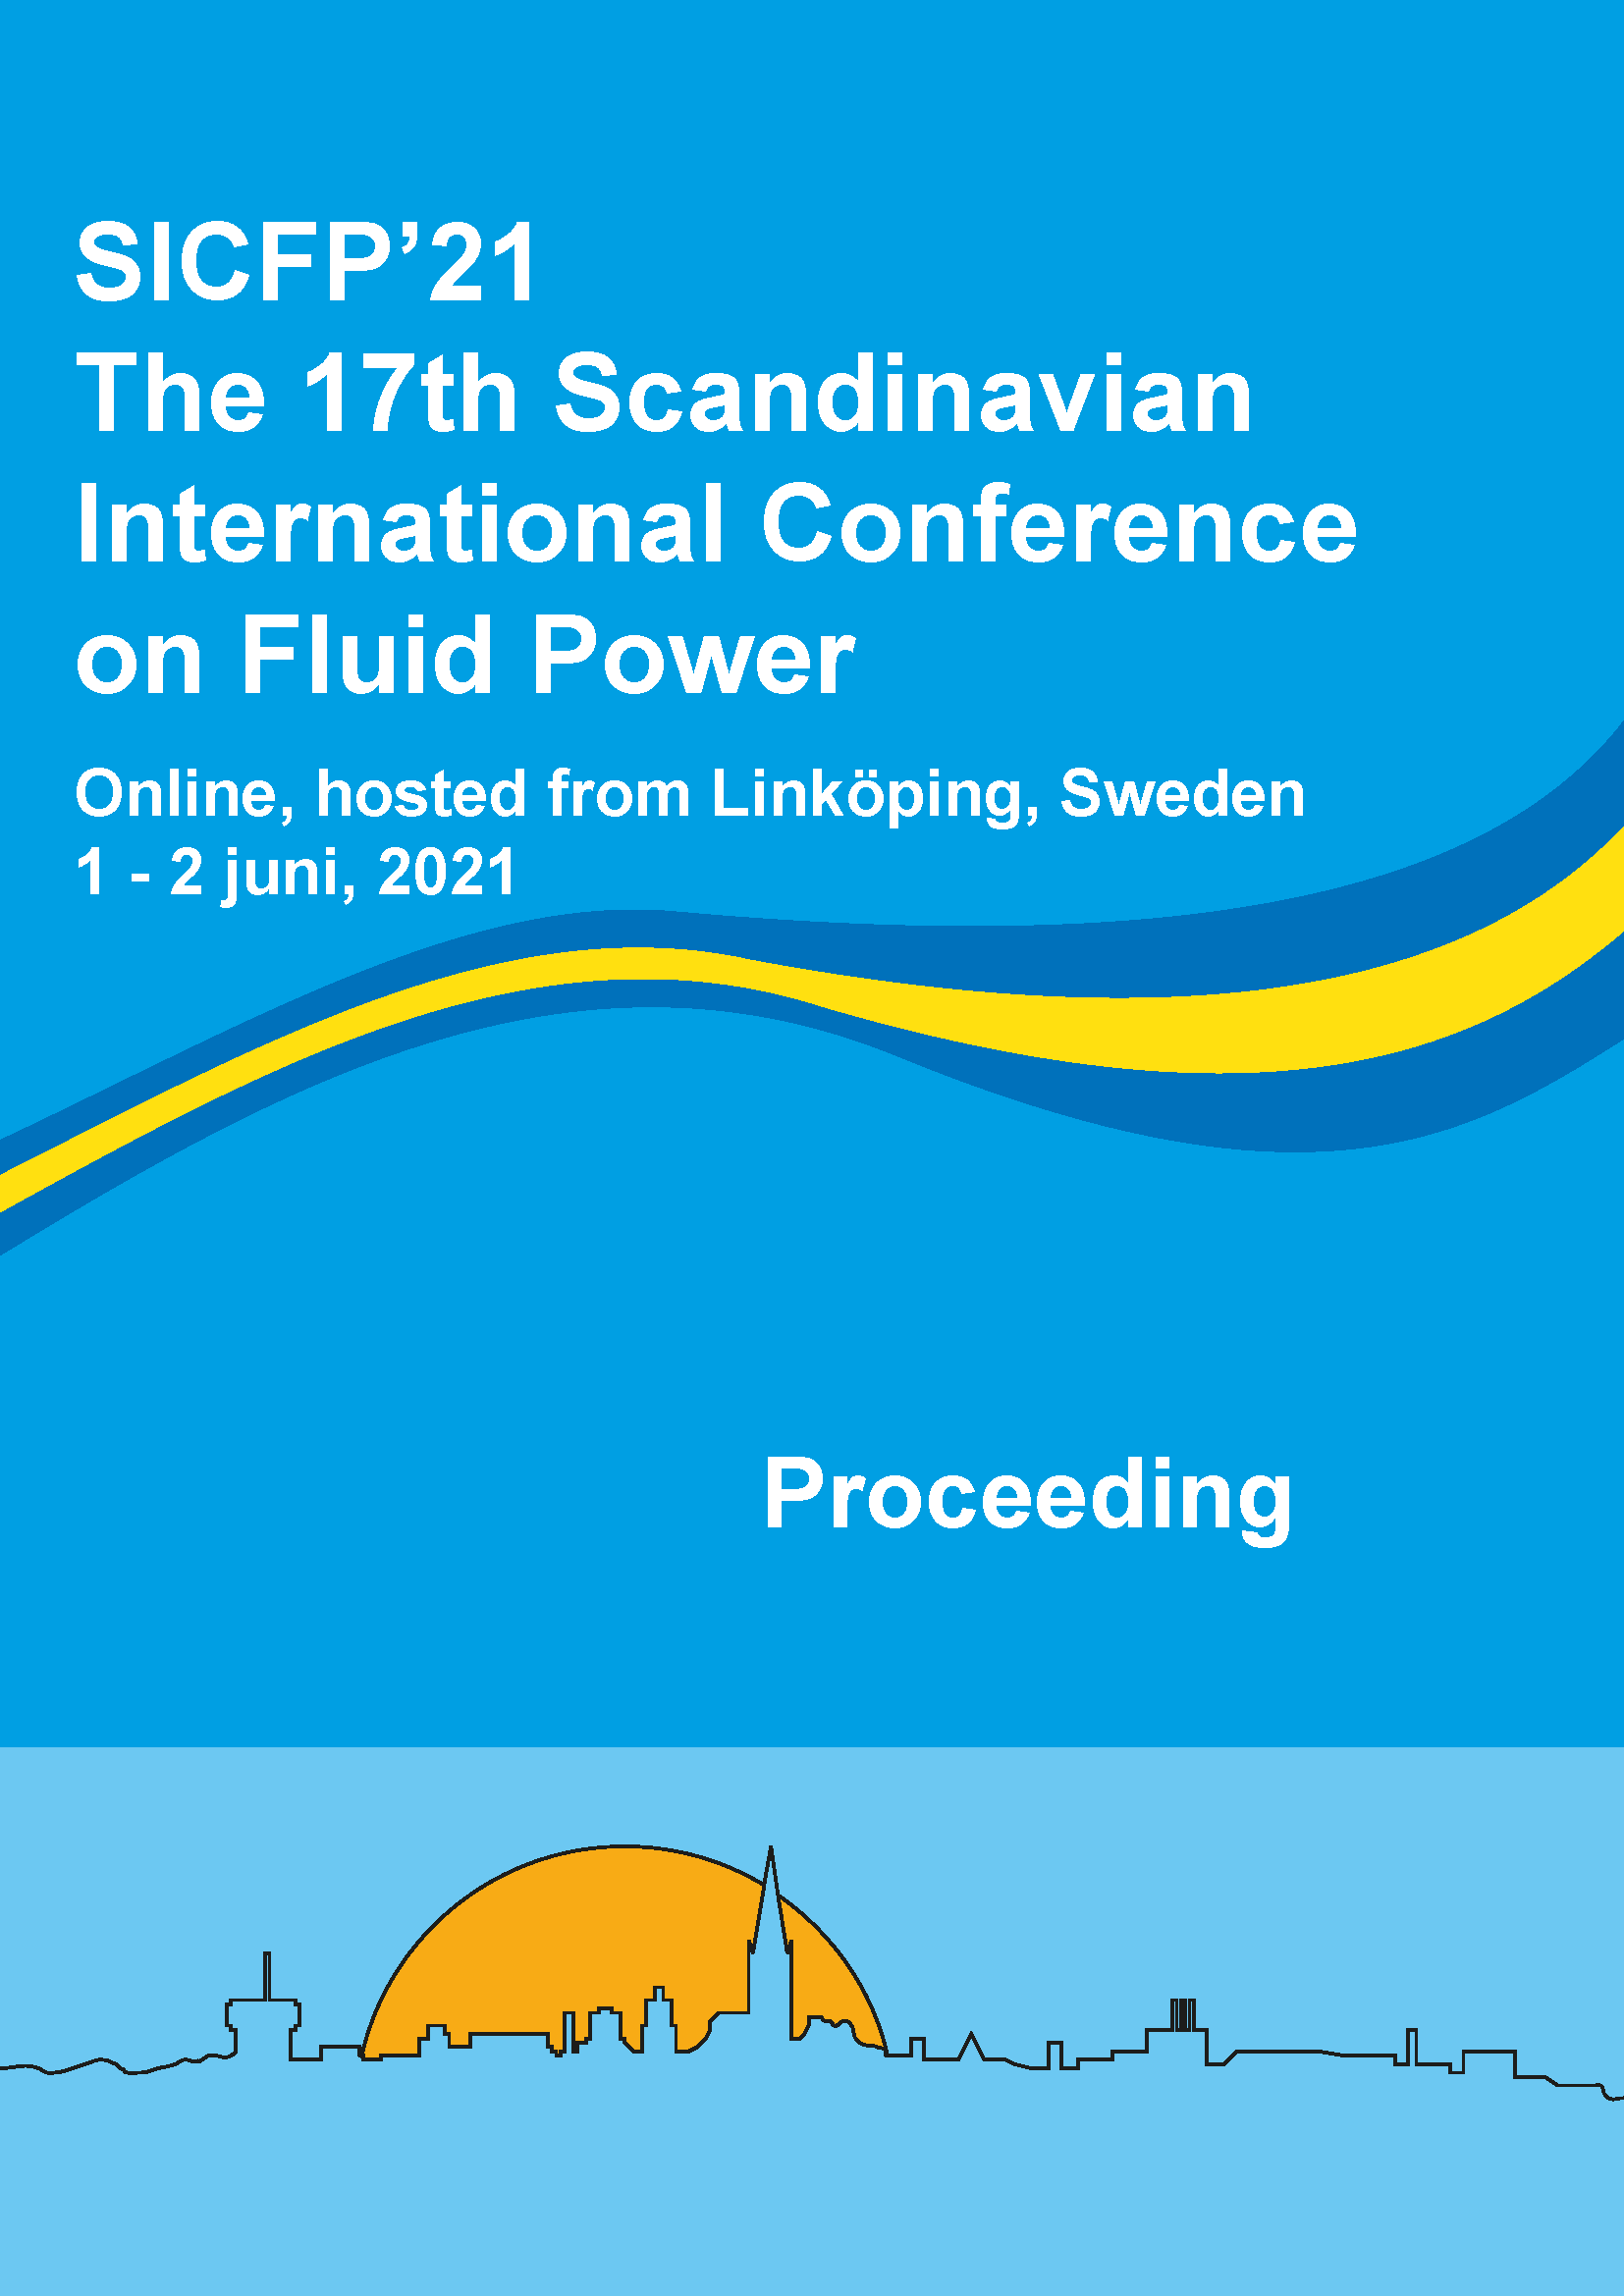 View Proceedings of the 17:th Scandinavian International Conference on Fluid Power, SICFP'21, June 1-2, 2021, Linköping, Sweden